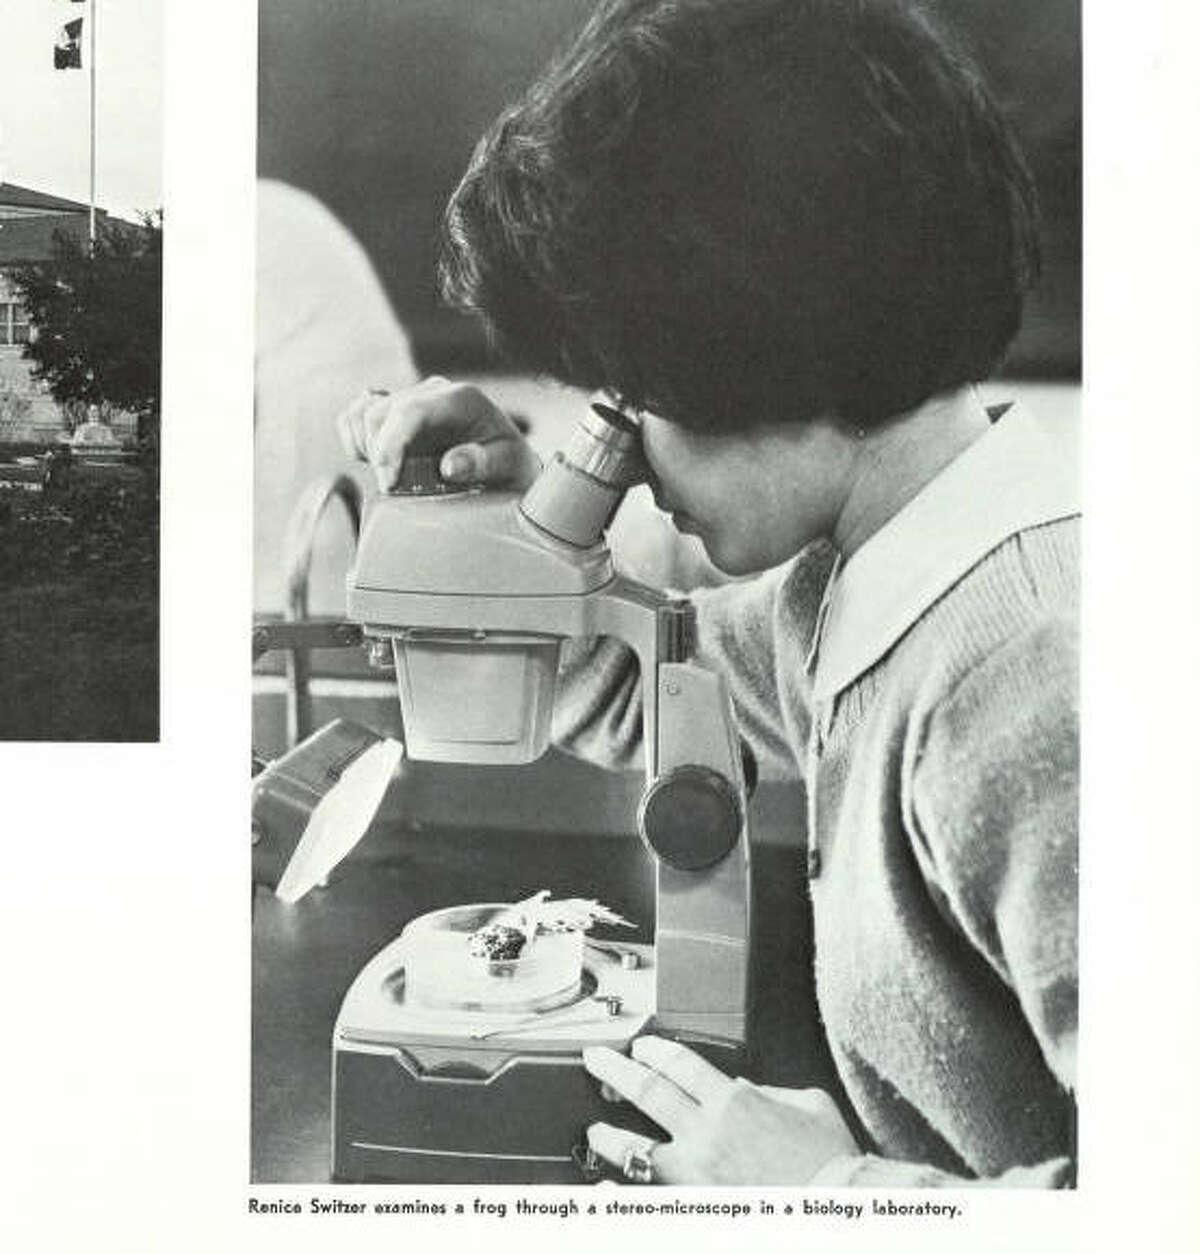 Yep, frogs were still gross/awesome under a microscope in 1966. Via Houstonian 1966.